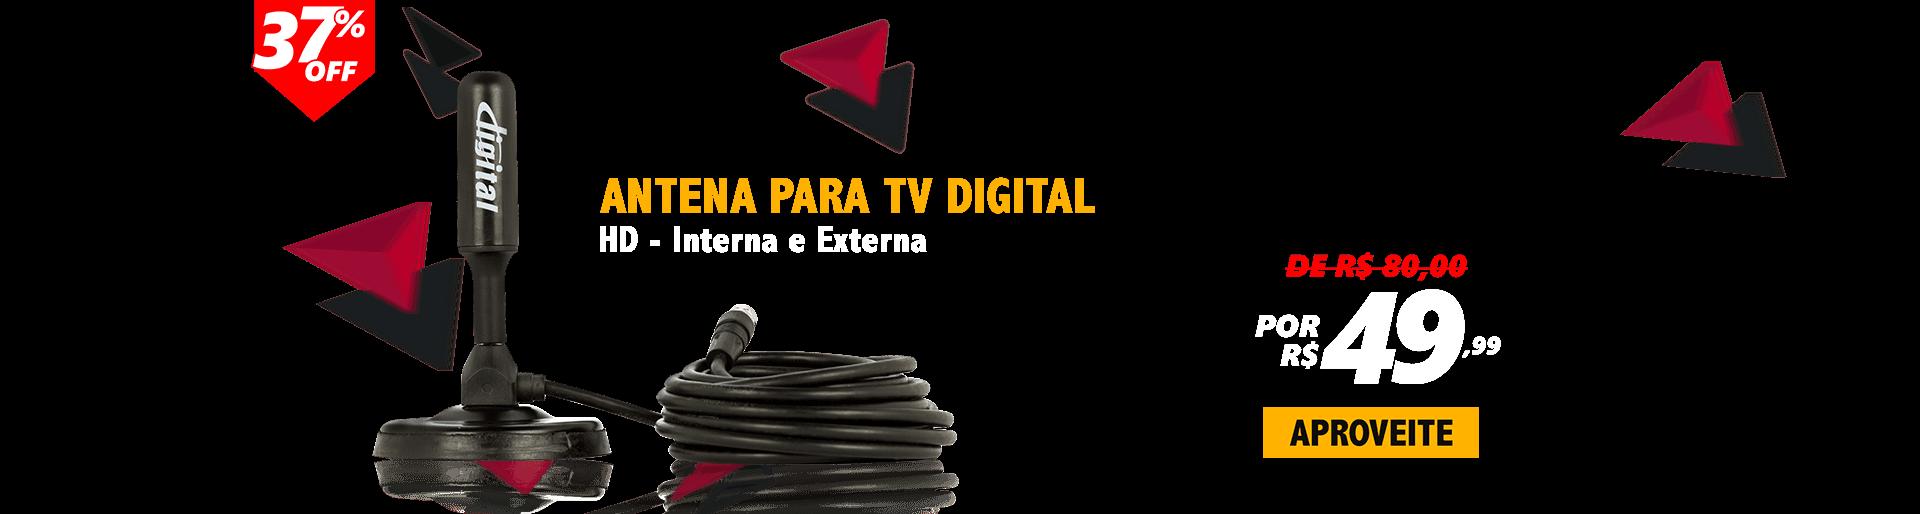 antena-para-tv-digital